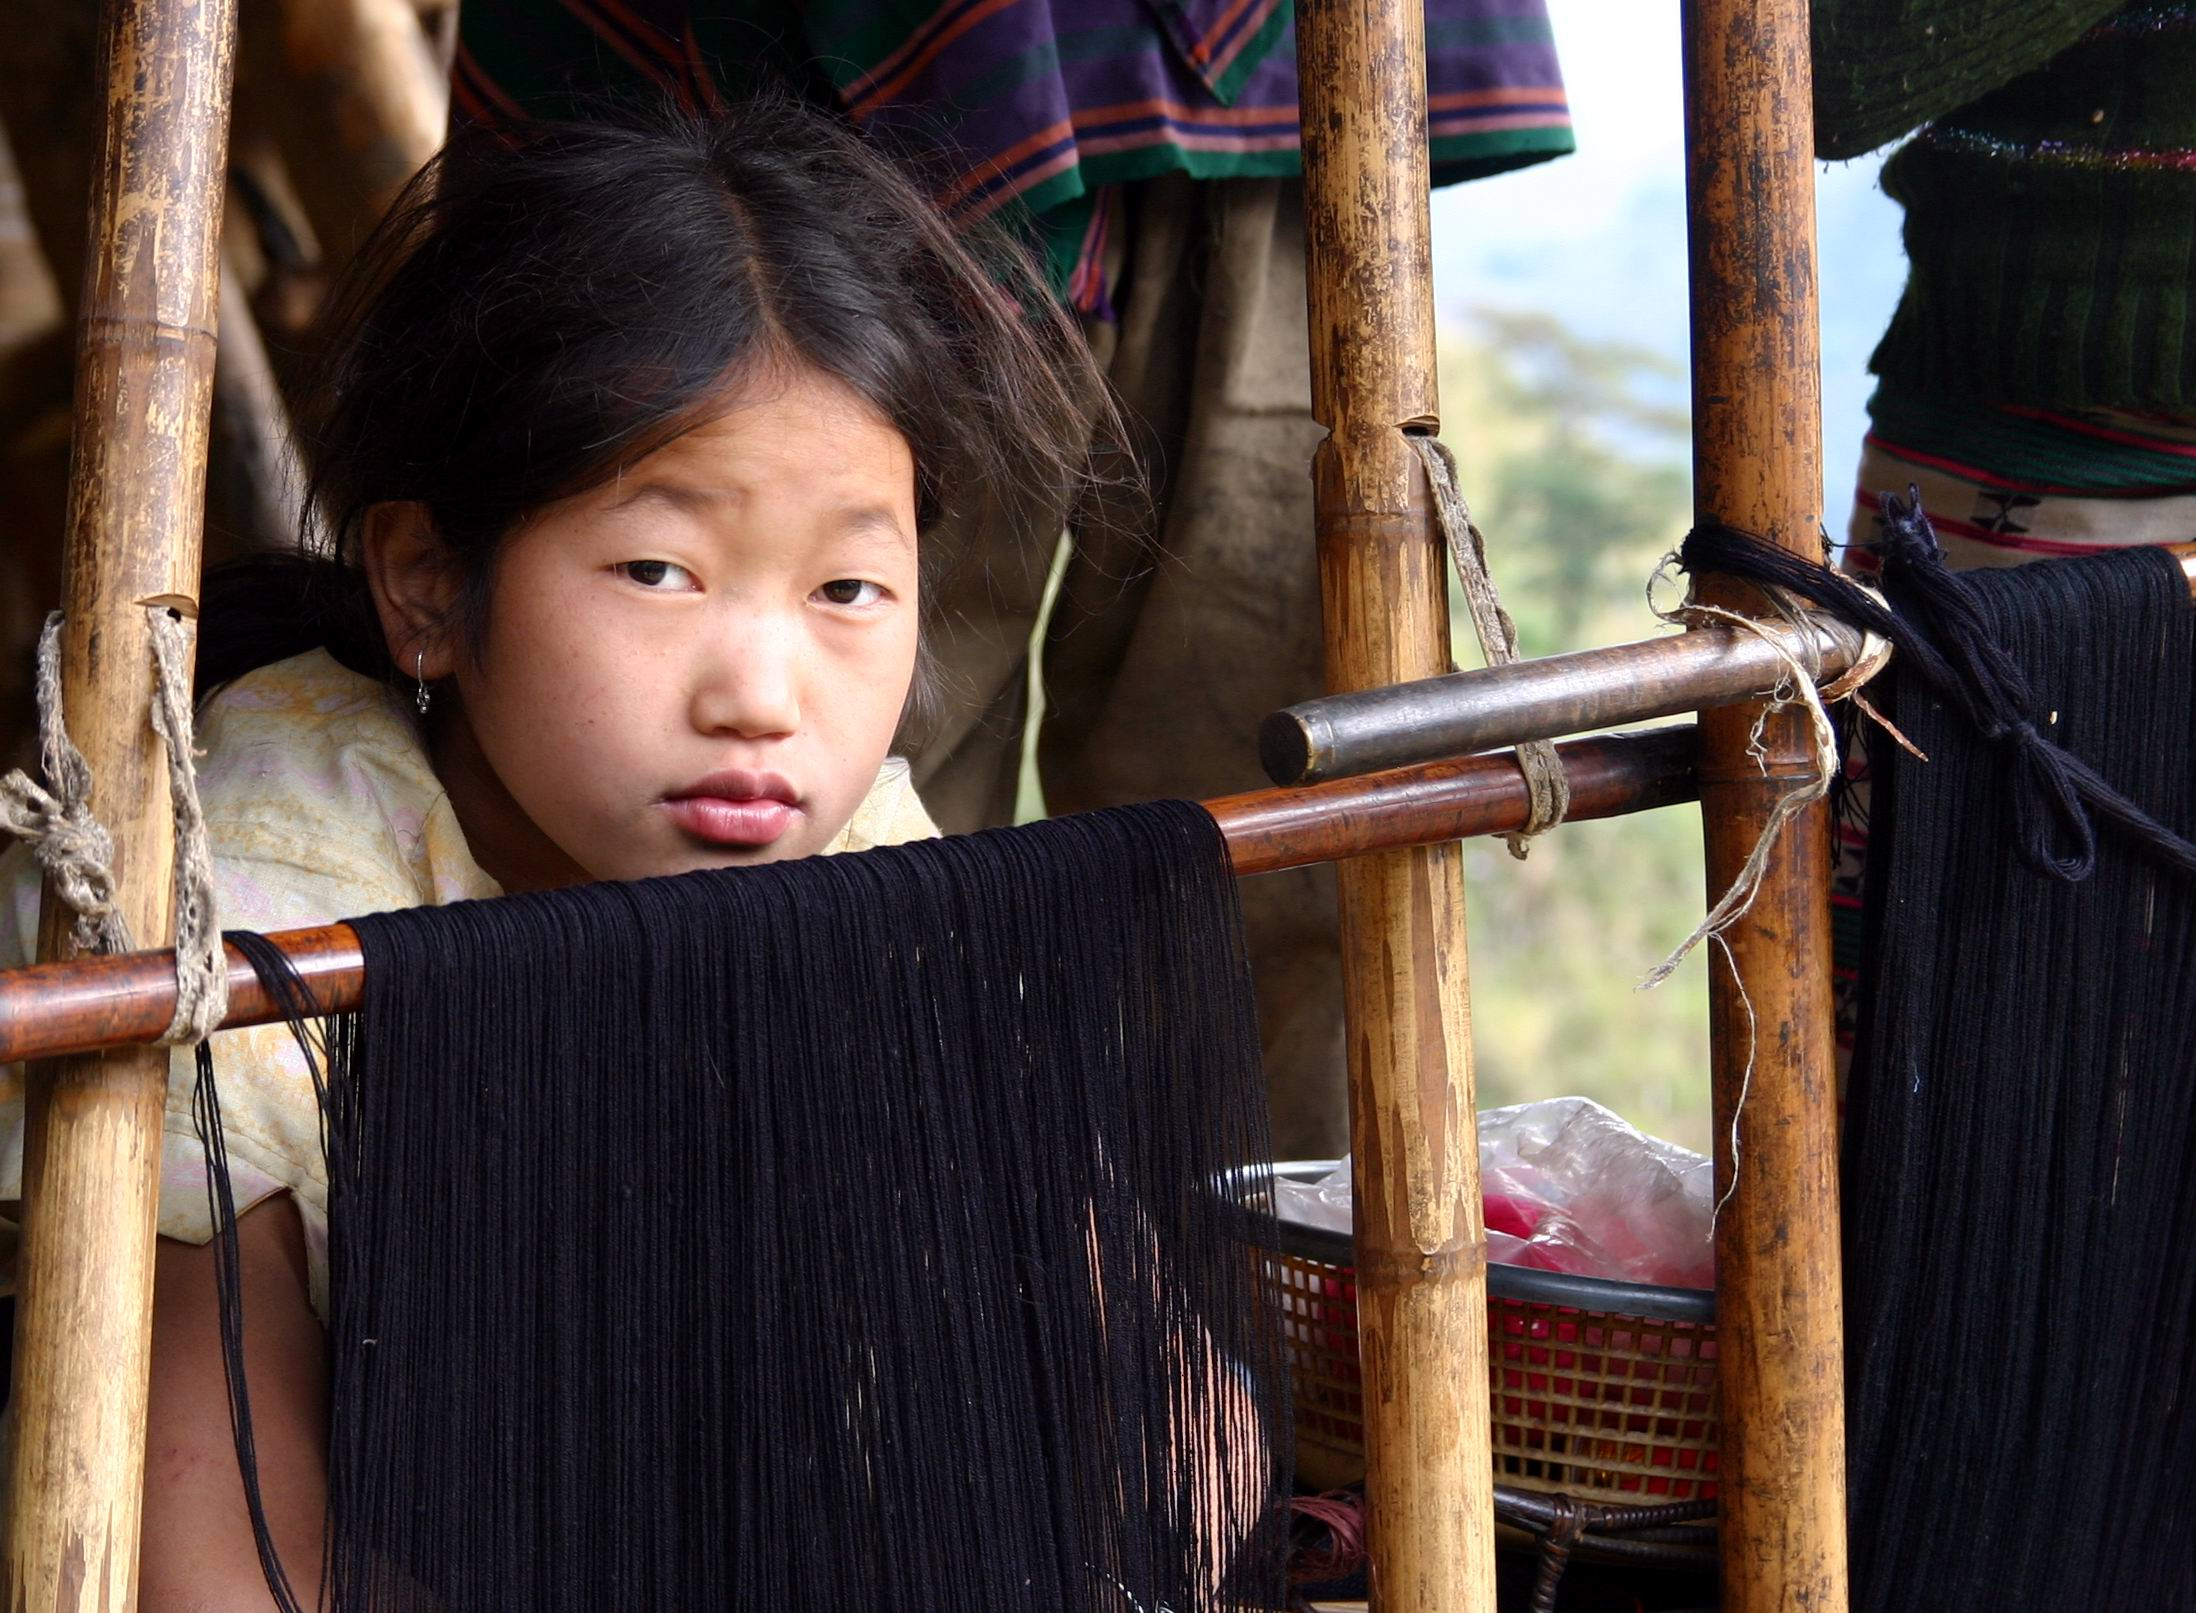 Photo of a girl: India Arunachal Pradesh Mishmi by Chris Erni